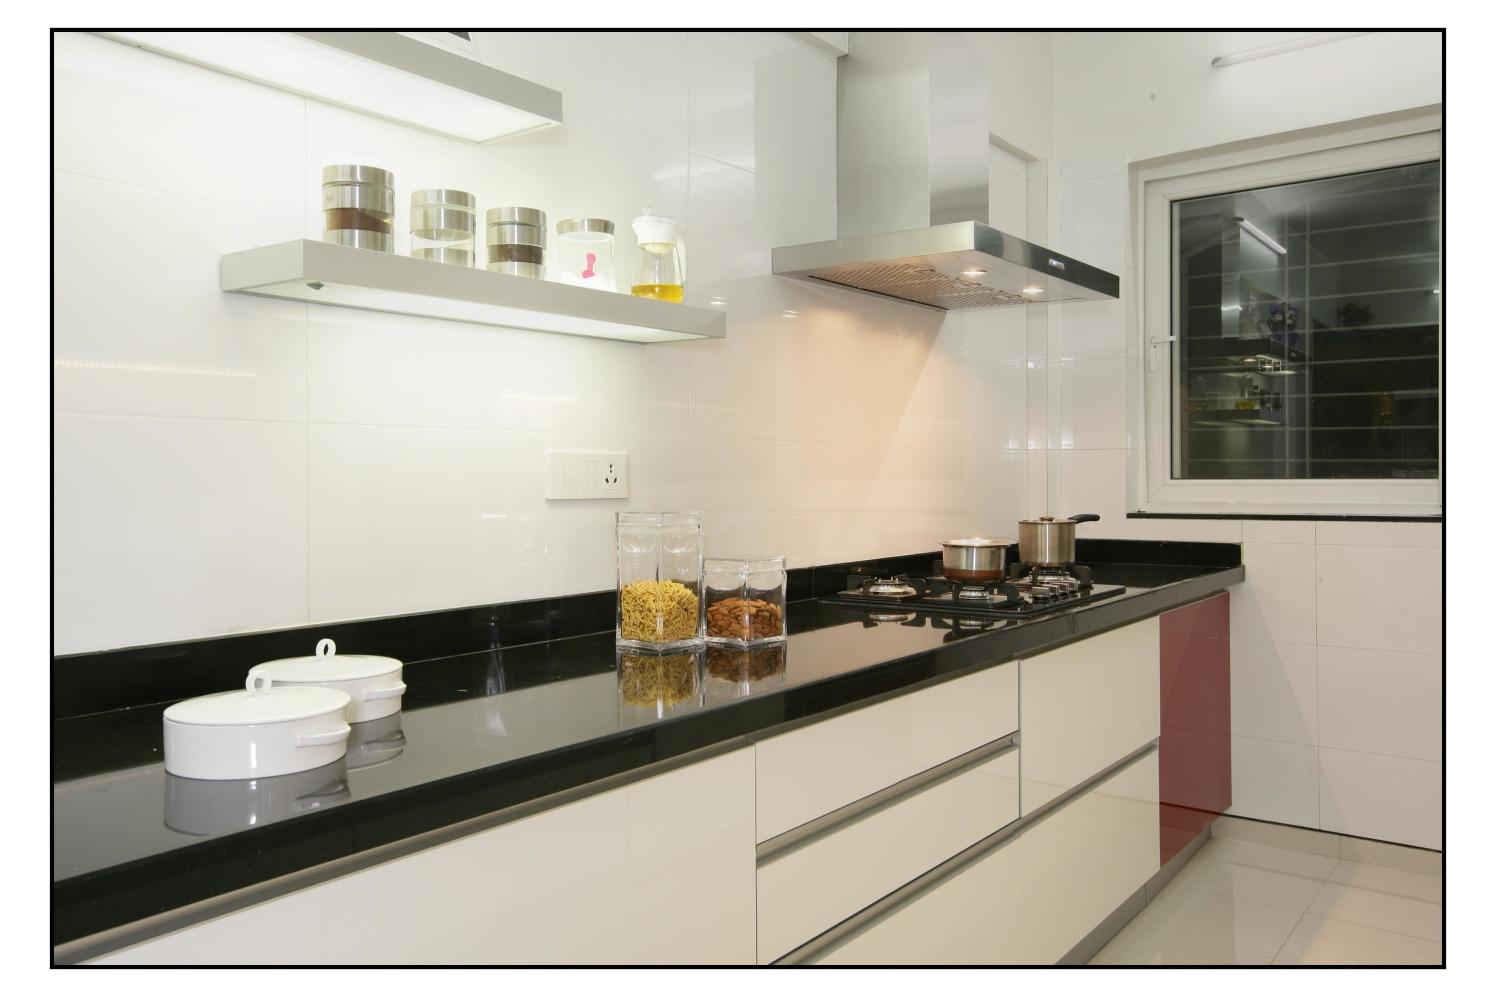 Mesmeric Beauty by Avinash Haridas khanajhode Modern | Interior Design Photos & Ideas